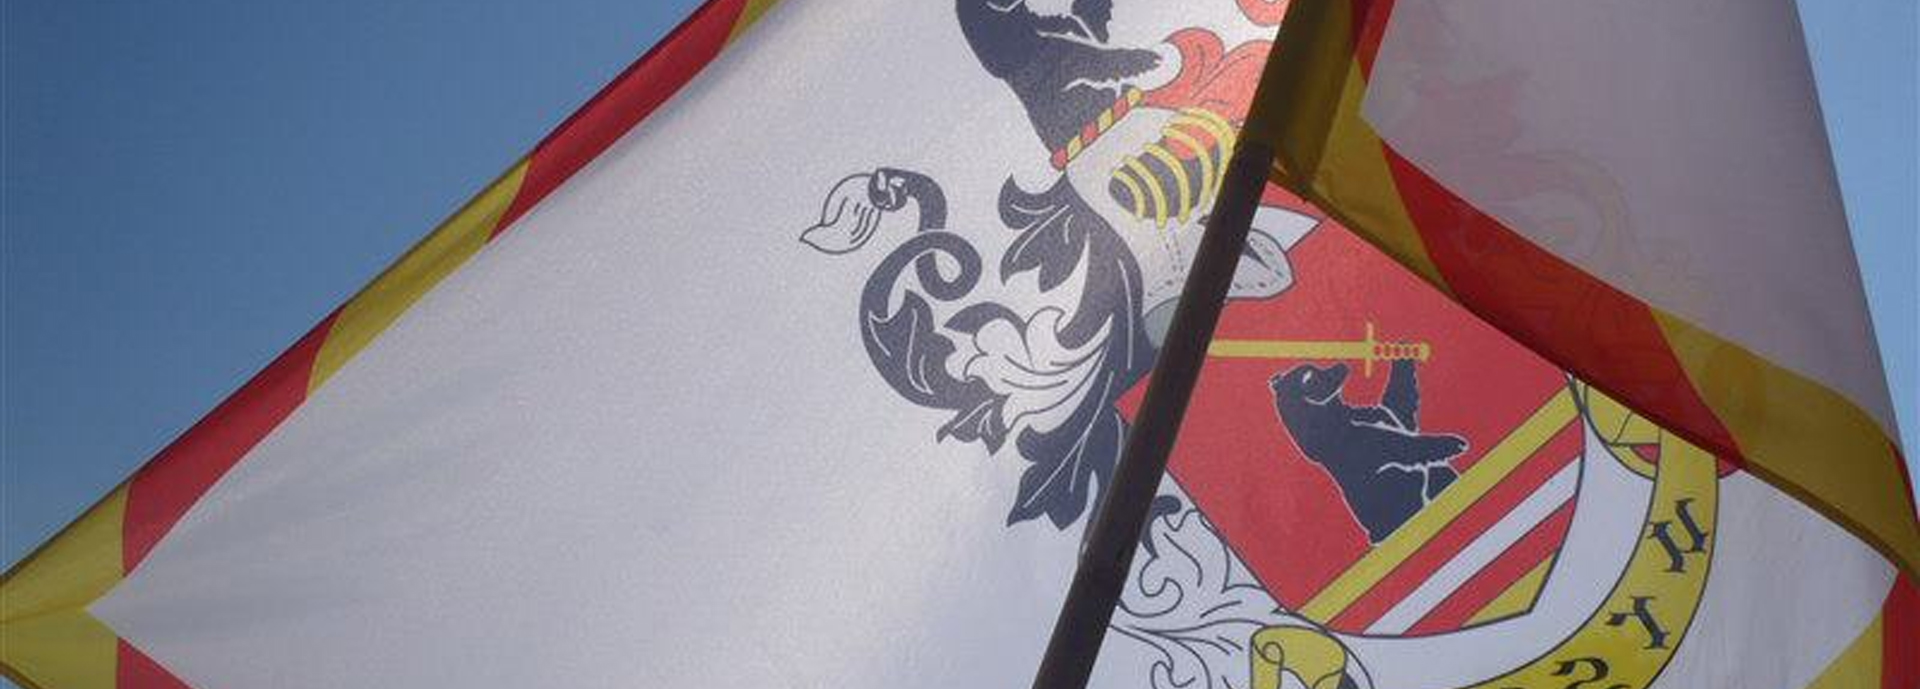 Skupina historického šermu URSUS - vlajka